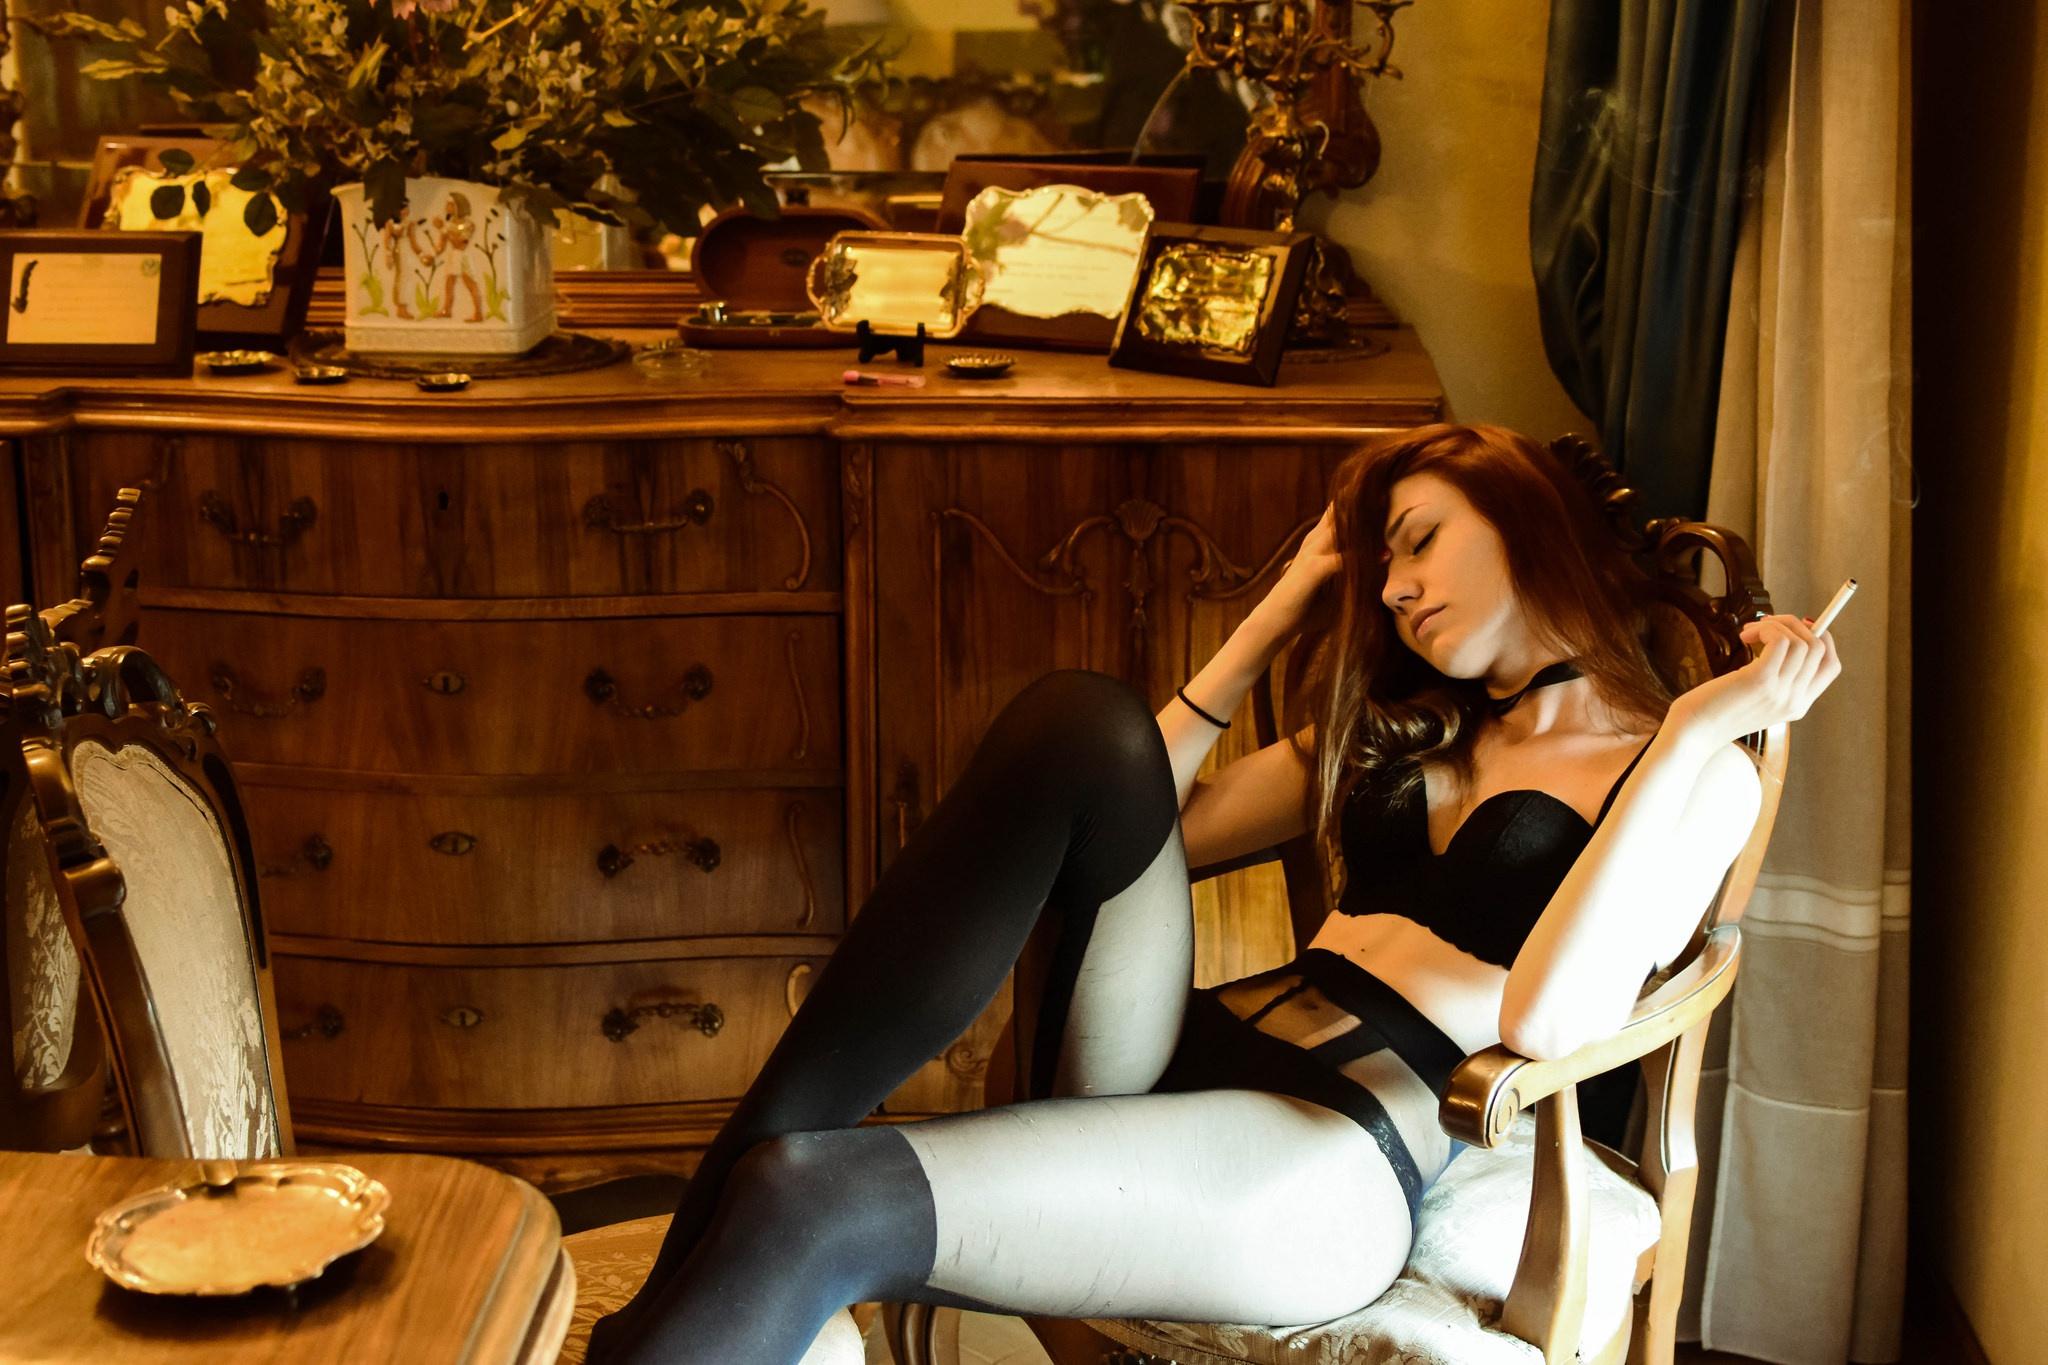 People 2048x1365 legs women smoking cigarettes model black lingerie pantyhose